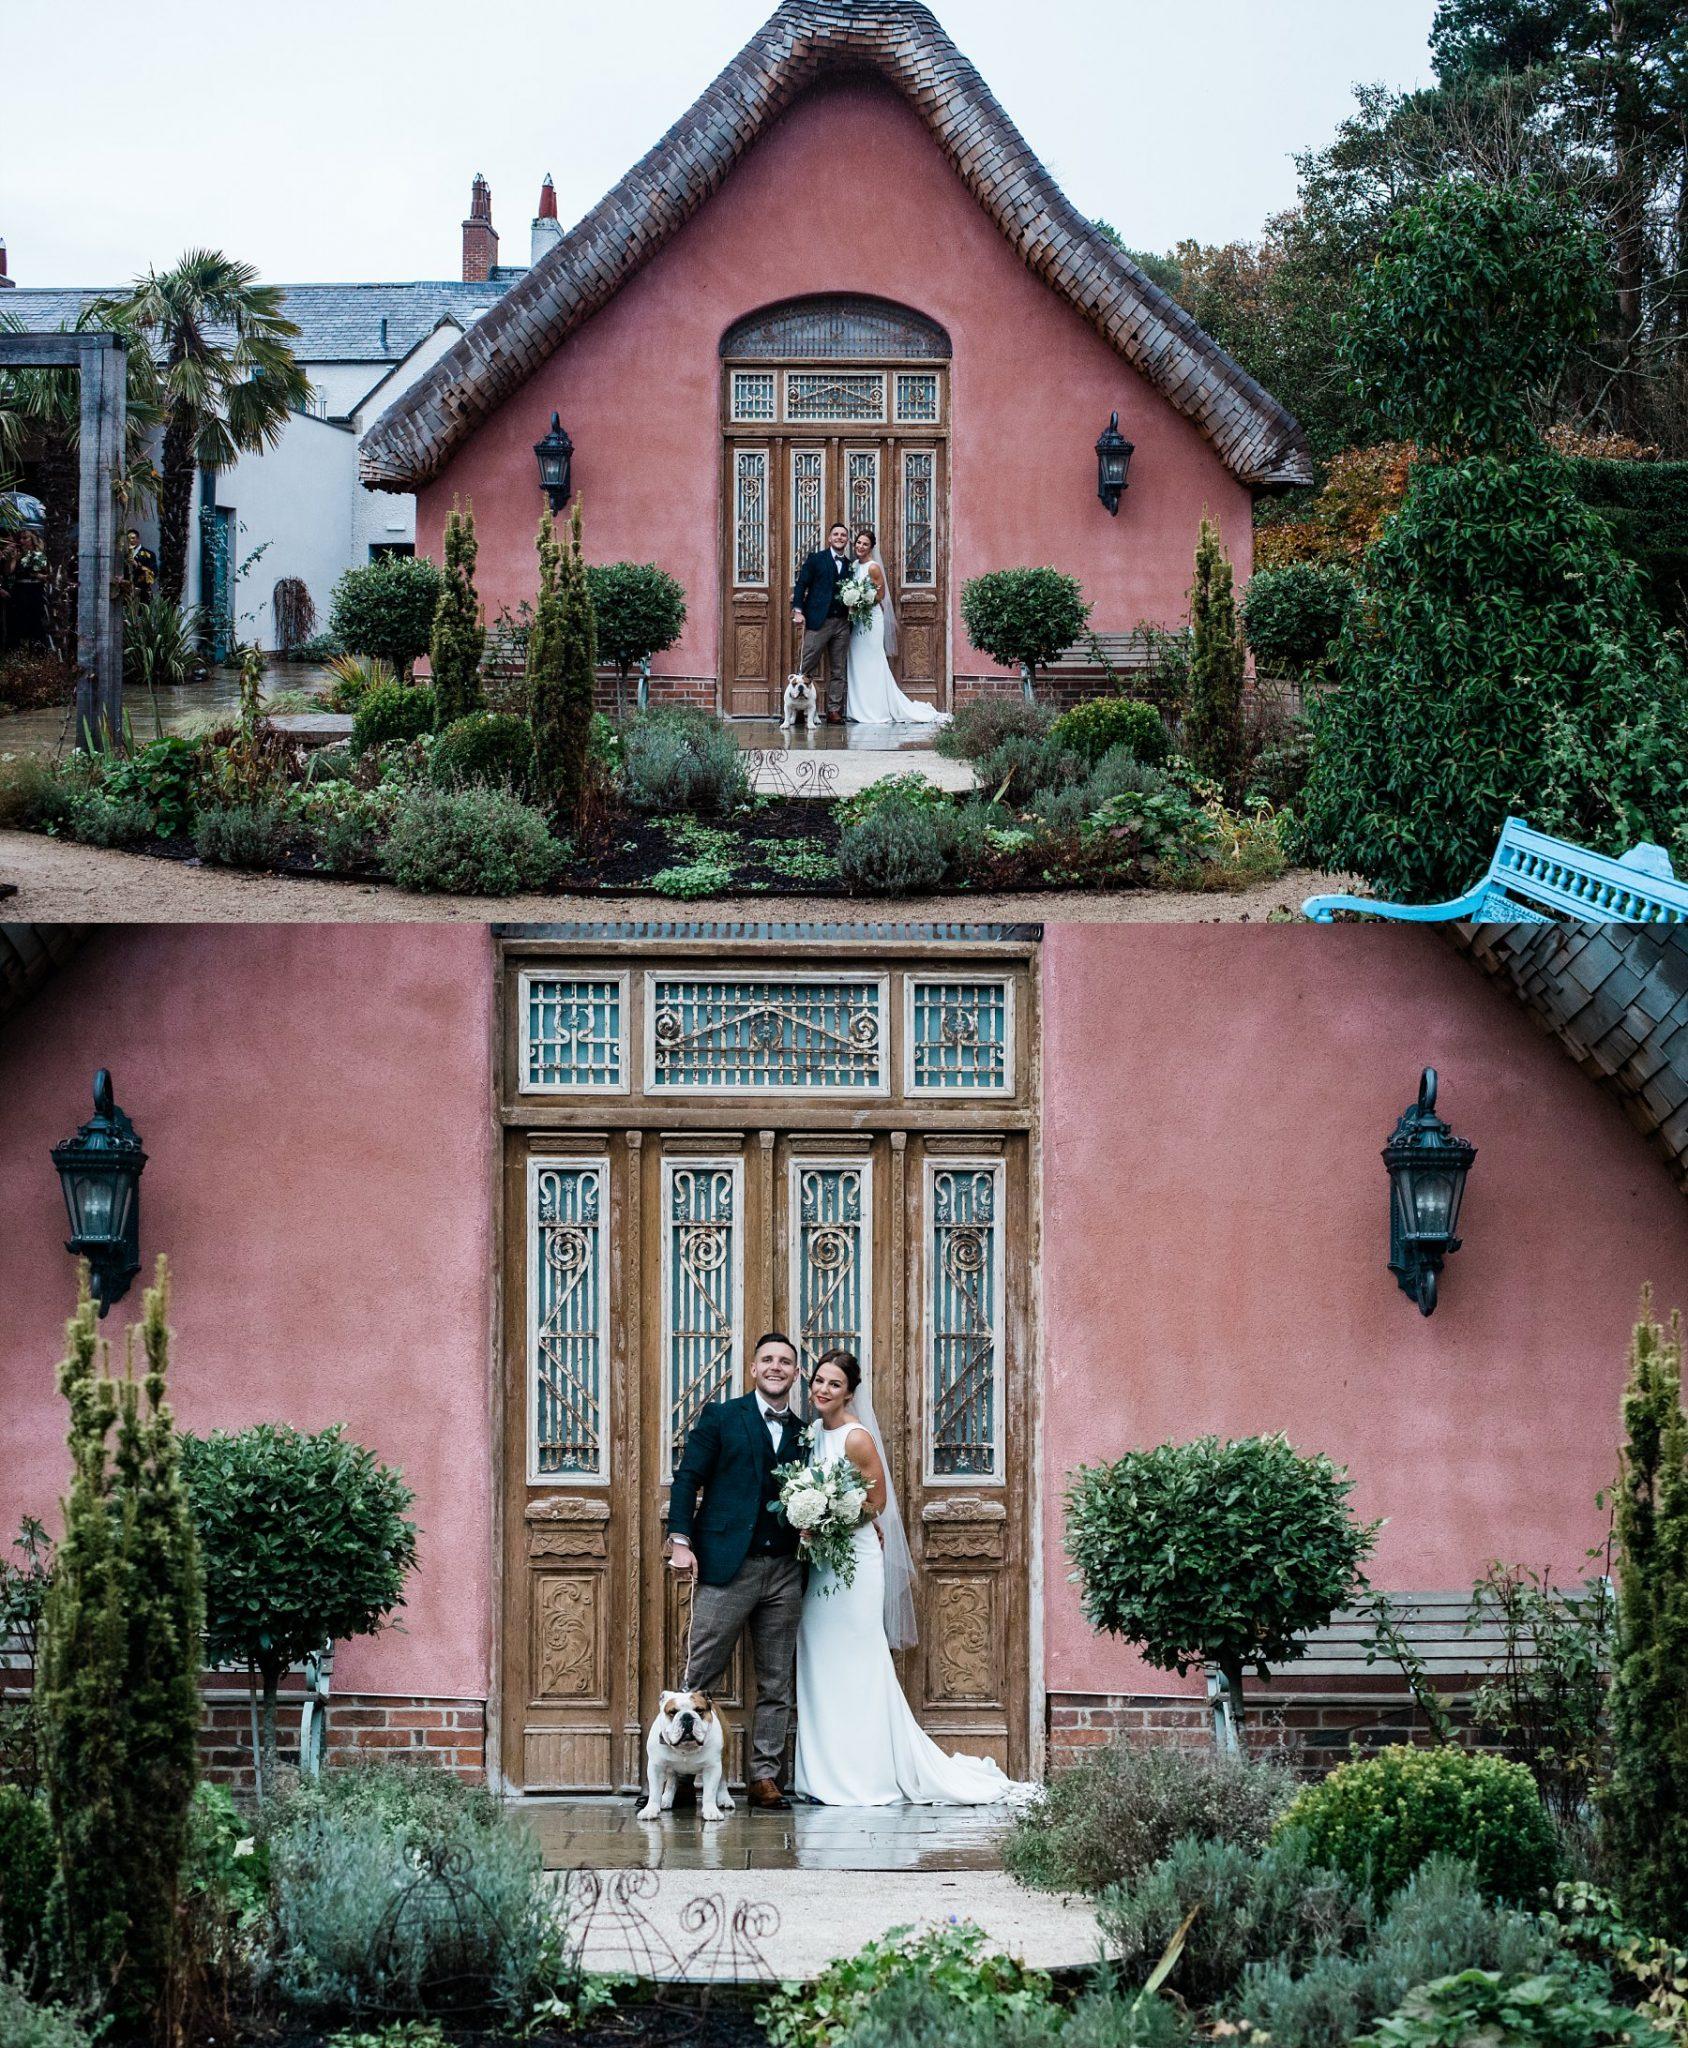 Bride & Groom Portraits Le petite Chateau wedding - Newcastle Wedding Photographer